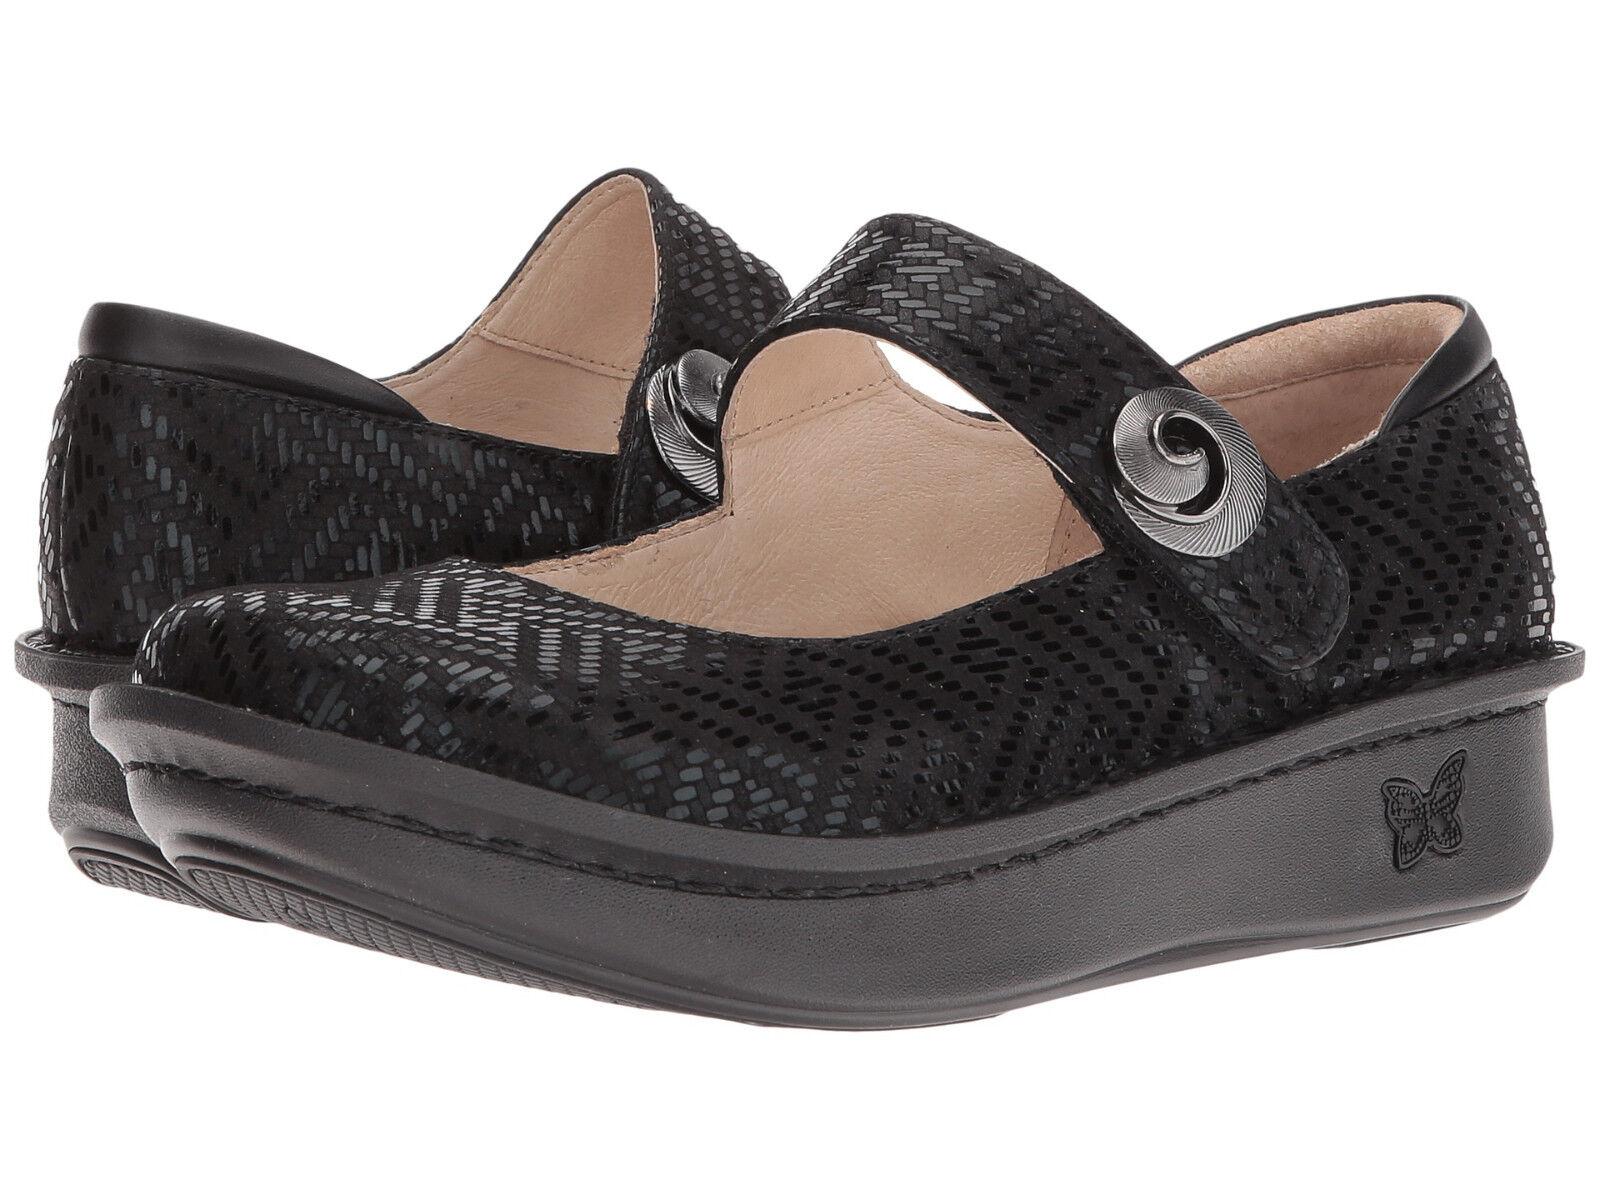 Women's Alegria Comfort Clogs Paloma Black Dazzler PAL-530